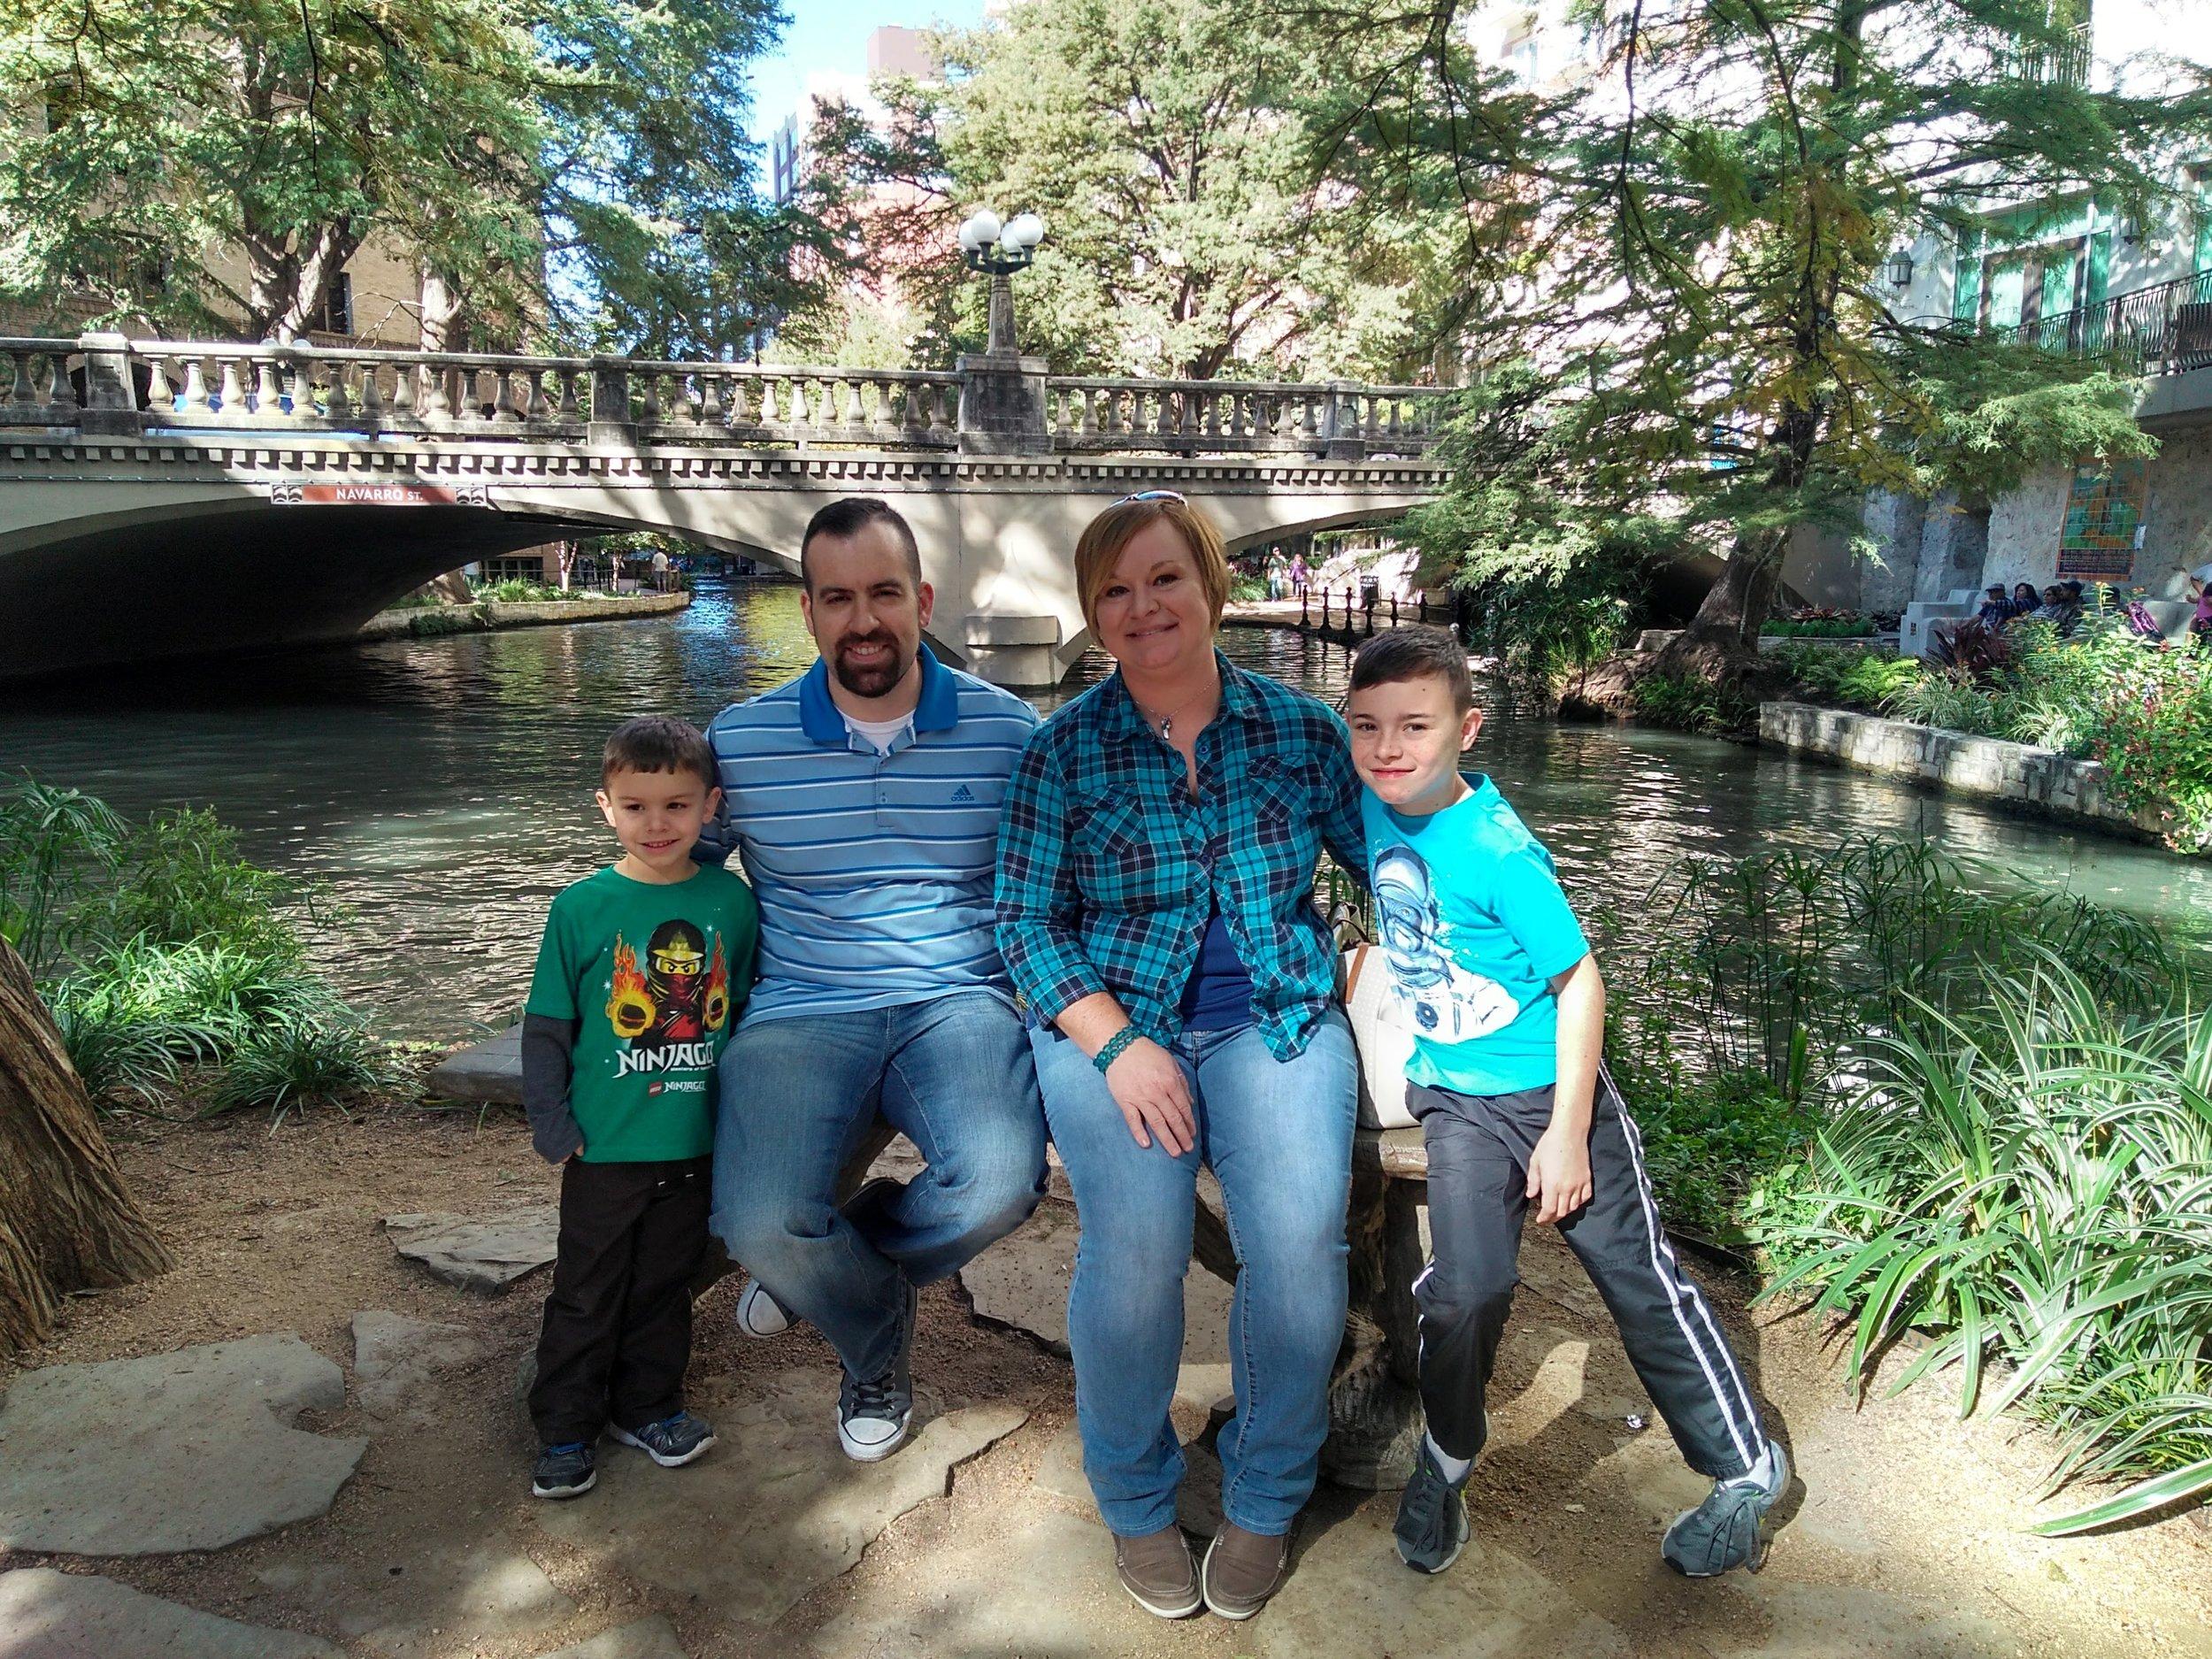 Jaime, her husband Josh, and their children.